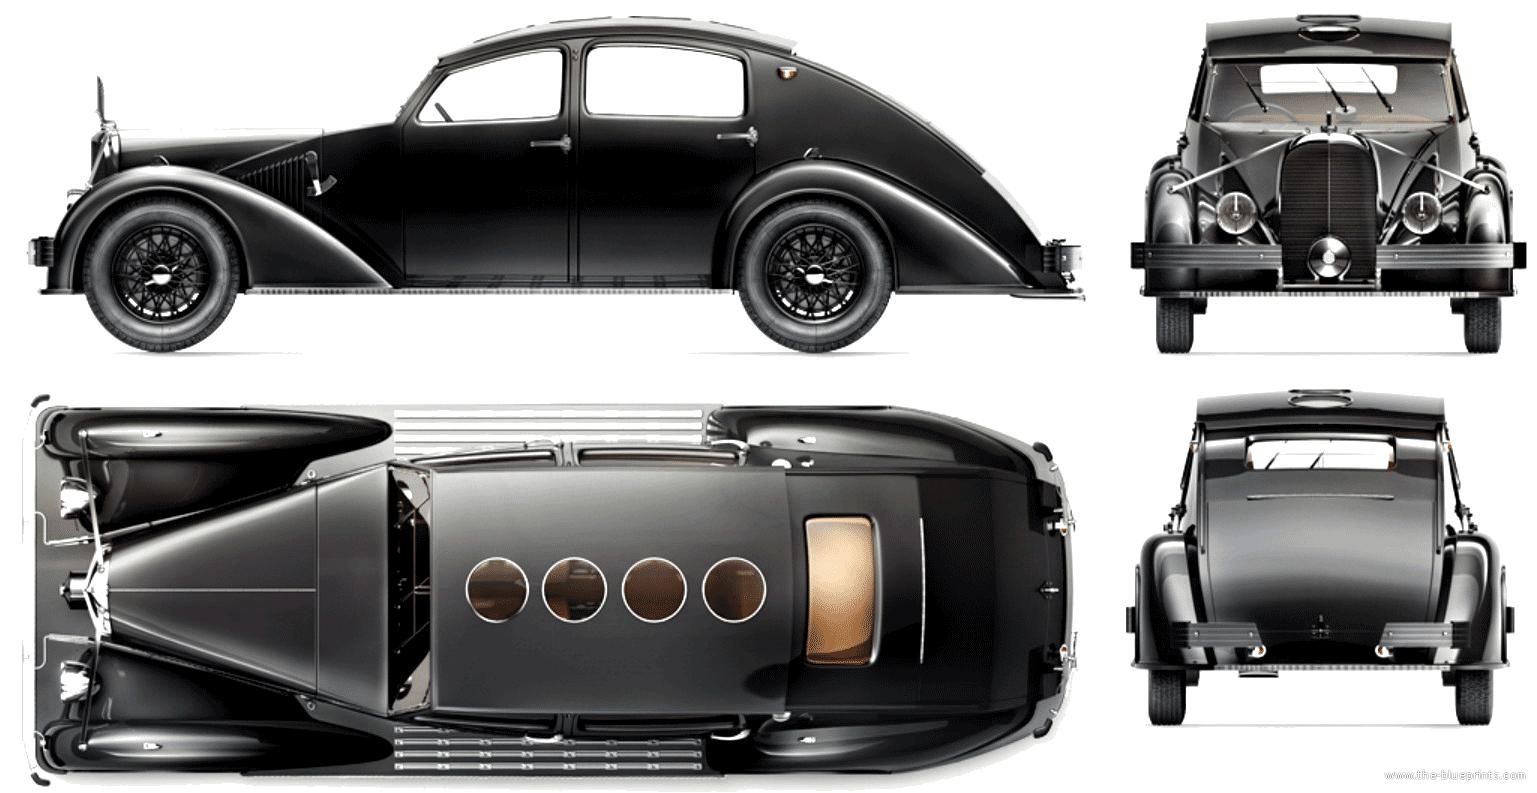 Porsche 911 gt3 997 furthermore Porsche 917k le mans likewise Bugatti veyron 16 4  2006 also Long Beach 2016 Poster in addition Porsche boxster 986. on porsche blueprints